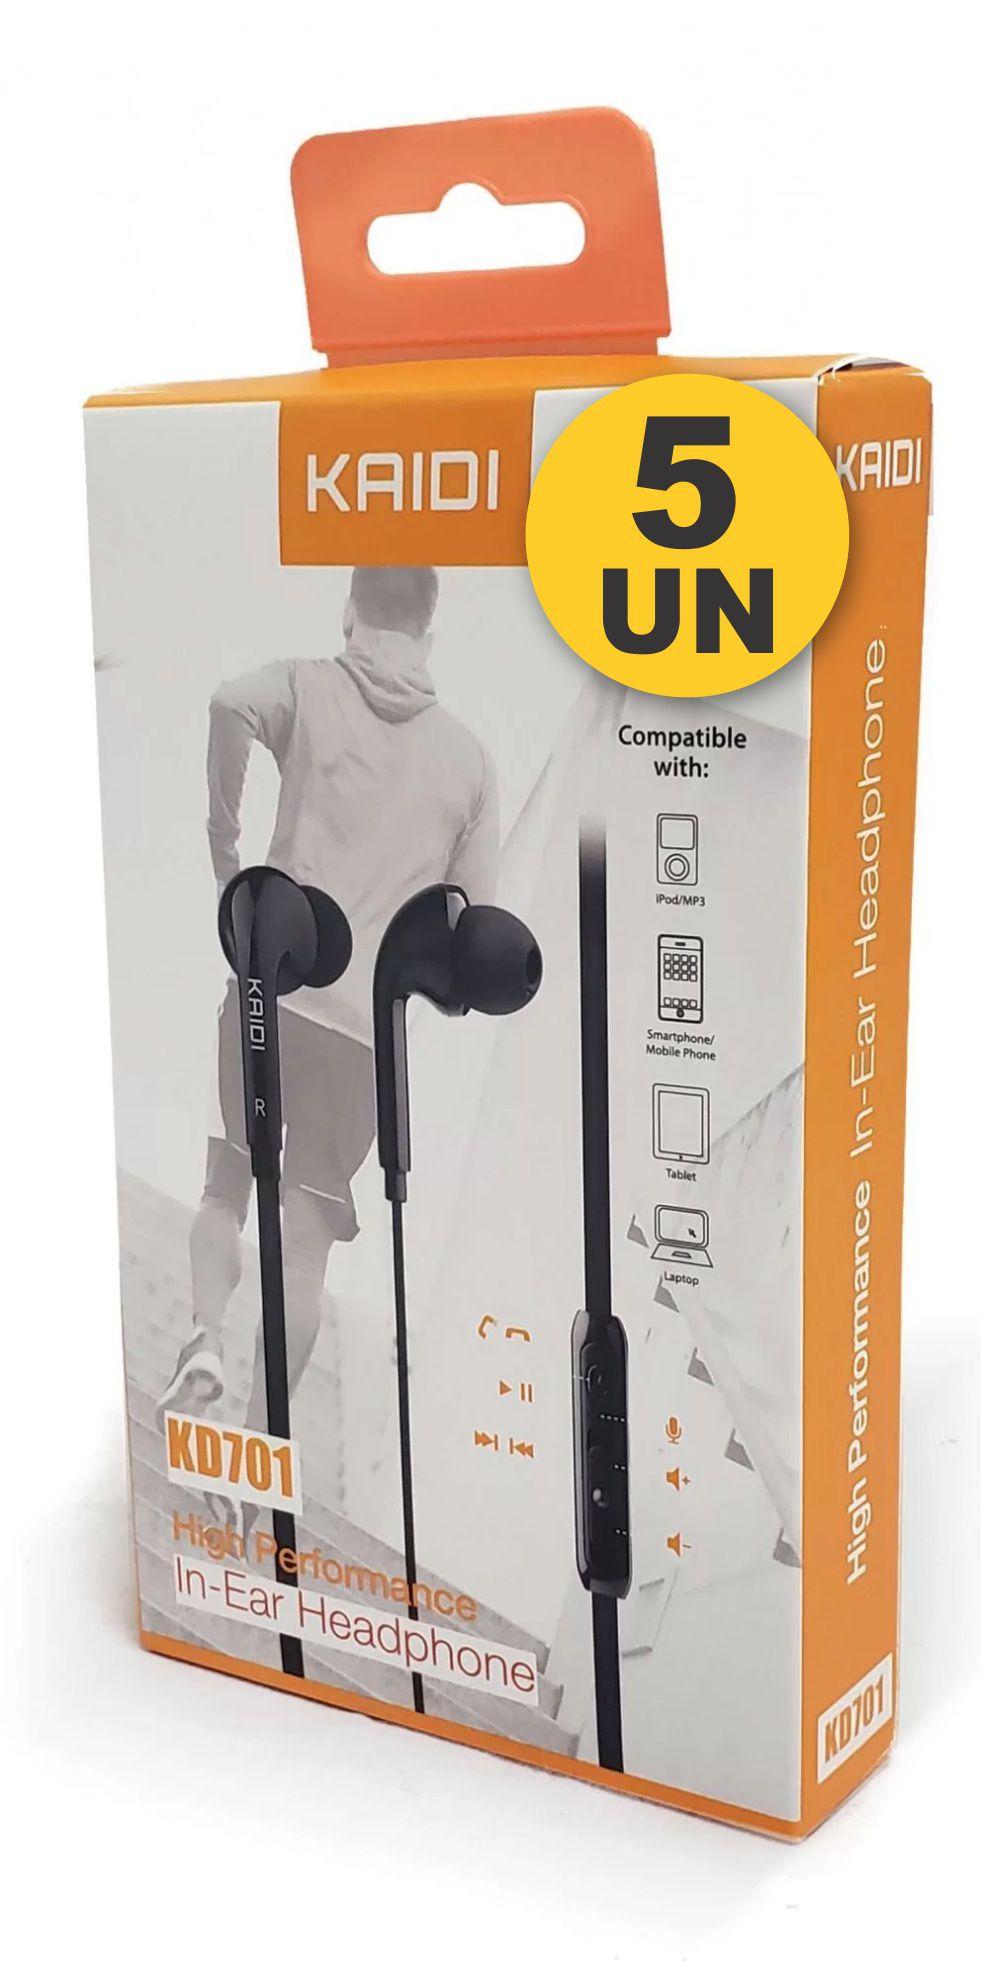 Kit 5x Fone de Ouvido Intra-Auricular P2 Kaidi KD701